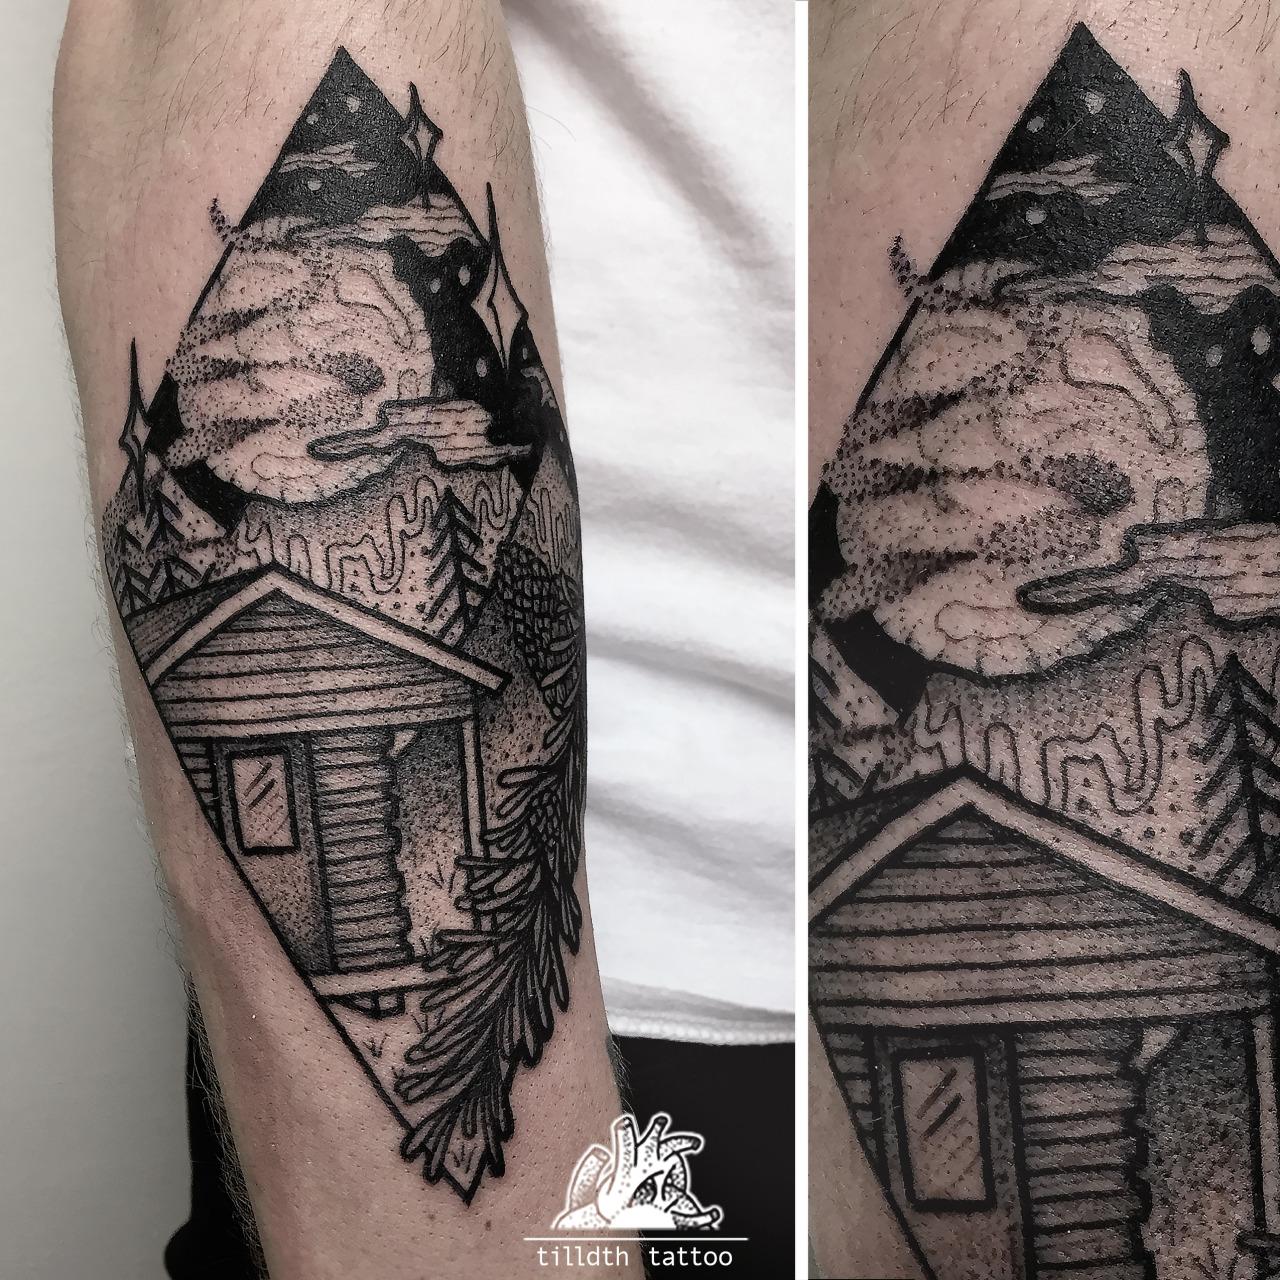 Tilldth Tattoo - the vandallist (10)